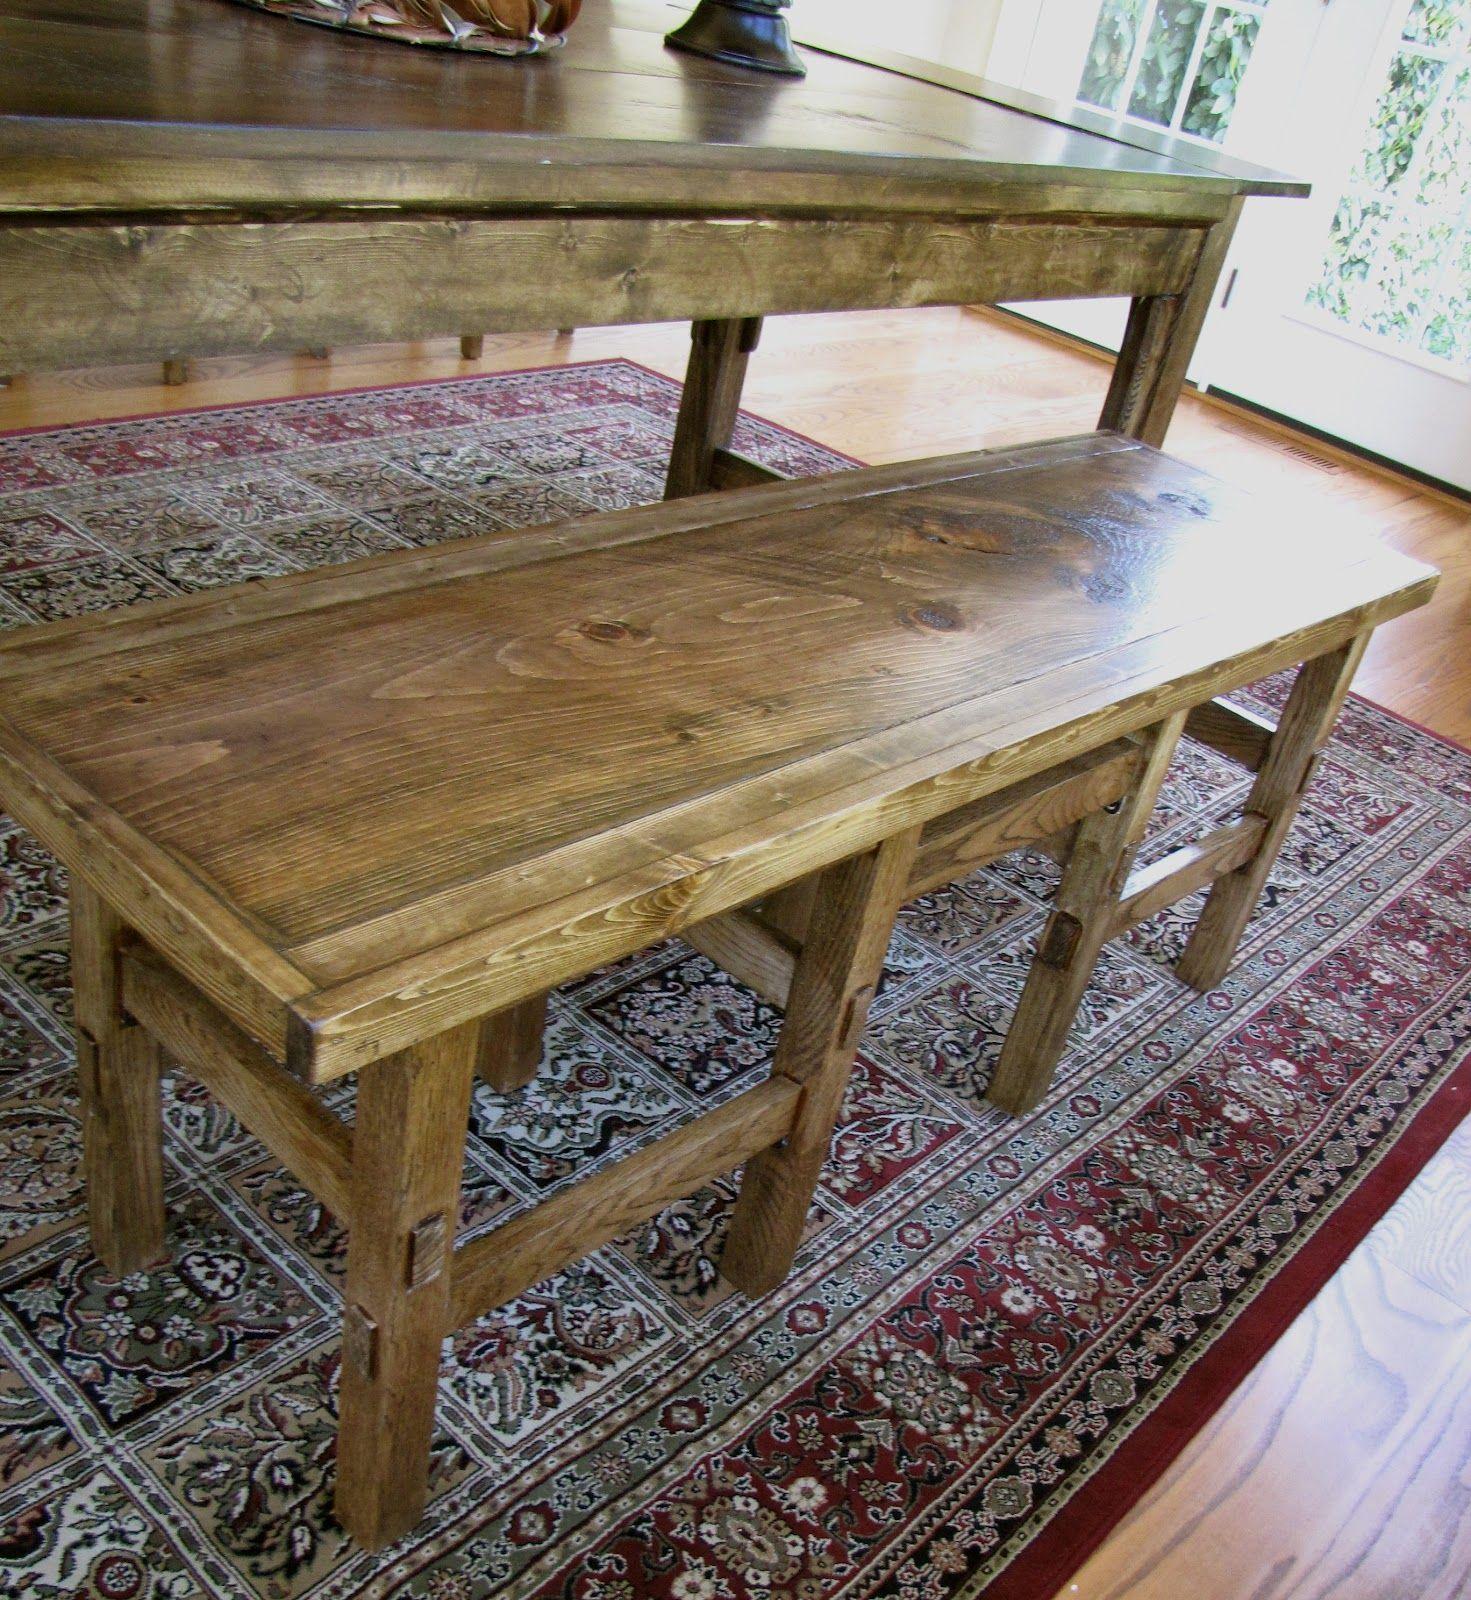 farmhouse bench farmhouse table with bench diy dining room table farmhouse bench diy on farmhouse kitchen table diy id=63583